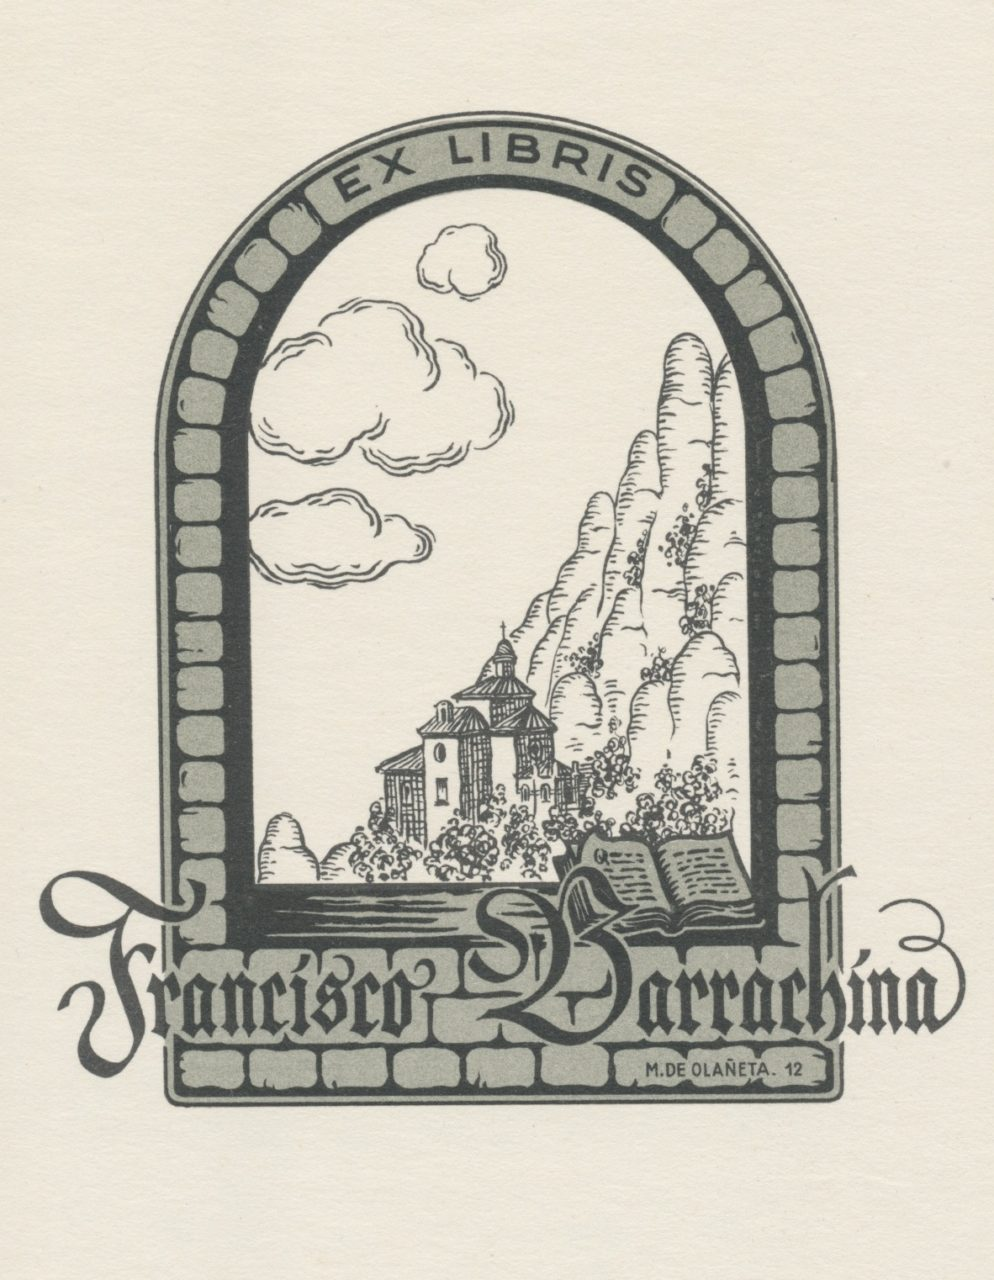 Ex Libris Francisco Barrachina - Mercedes de Olaneta 2 euro 02